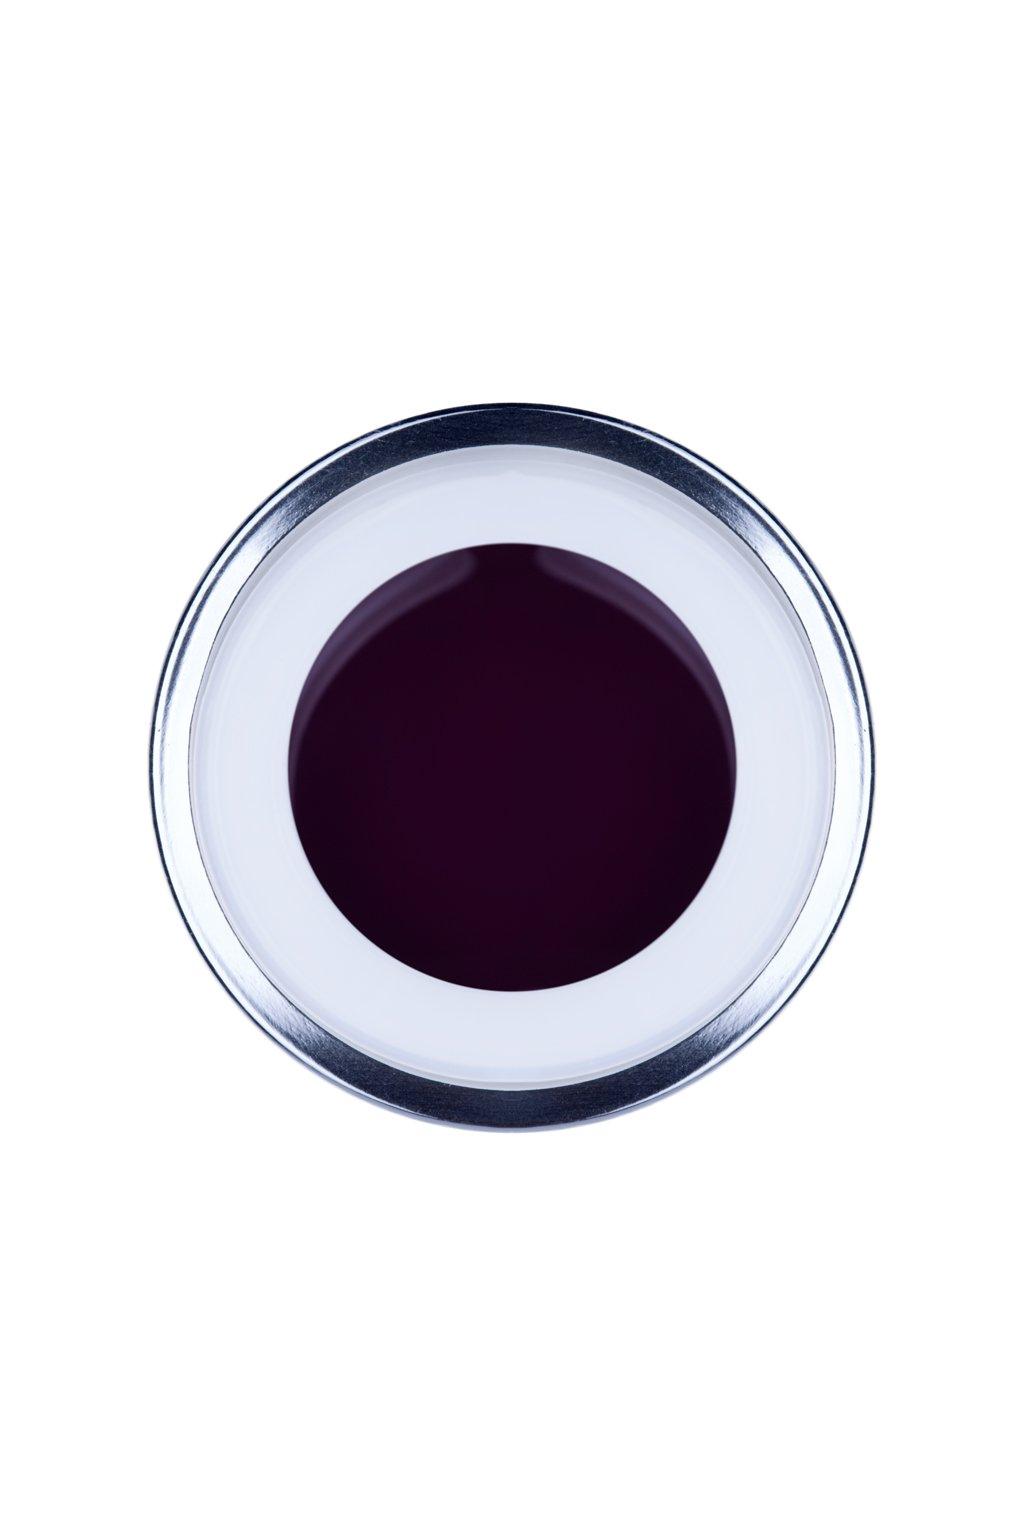 24965 black currant